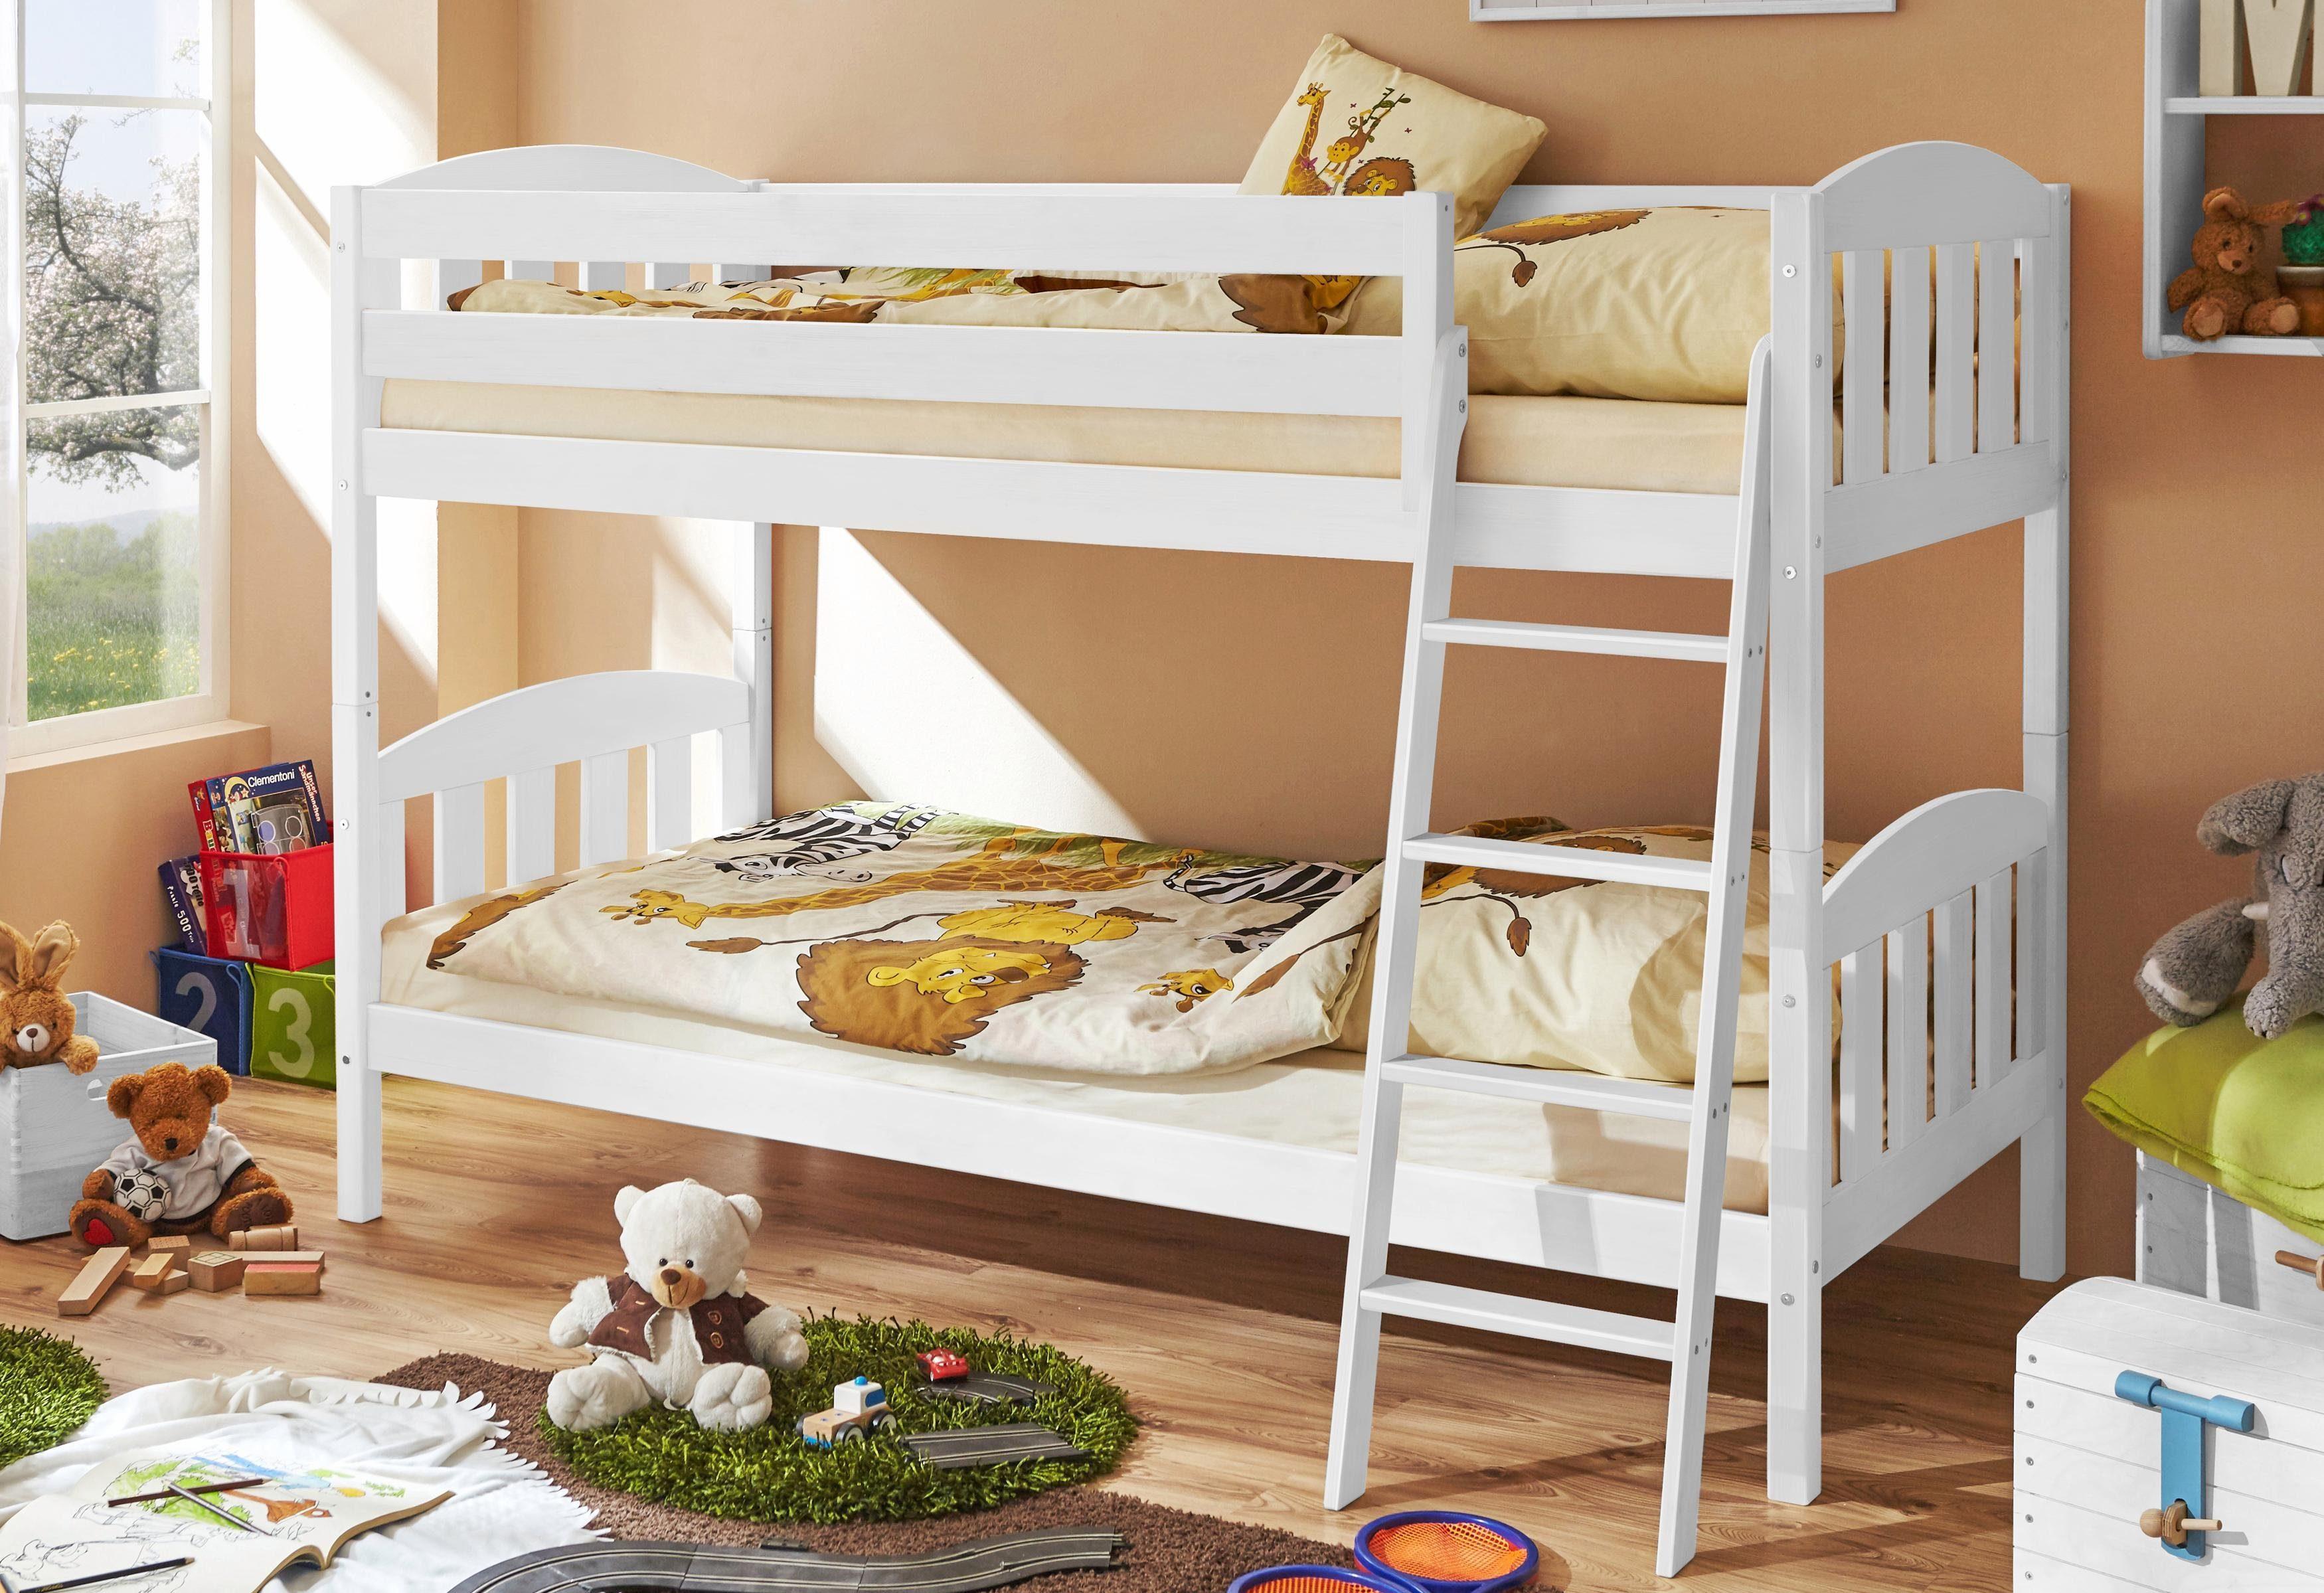 Ticaa Etagenbett Rene : Ticaa etagenbett lupo buche weiß amazon küche haushalt